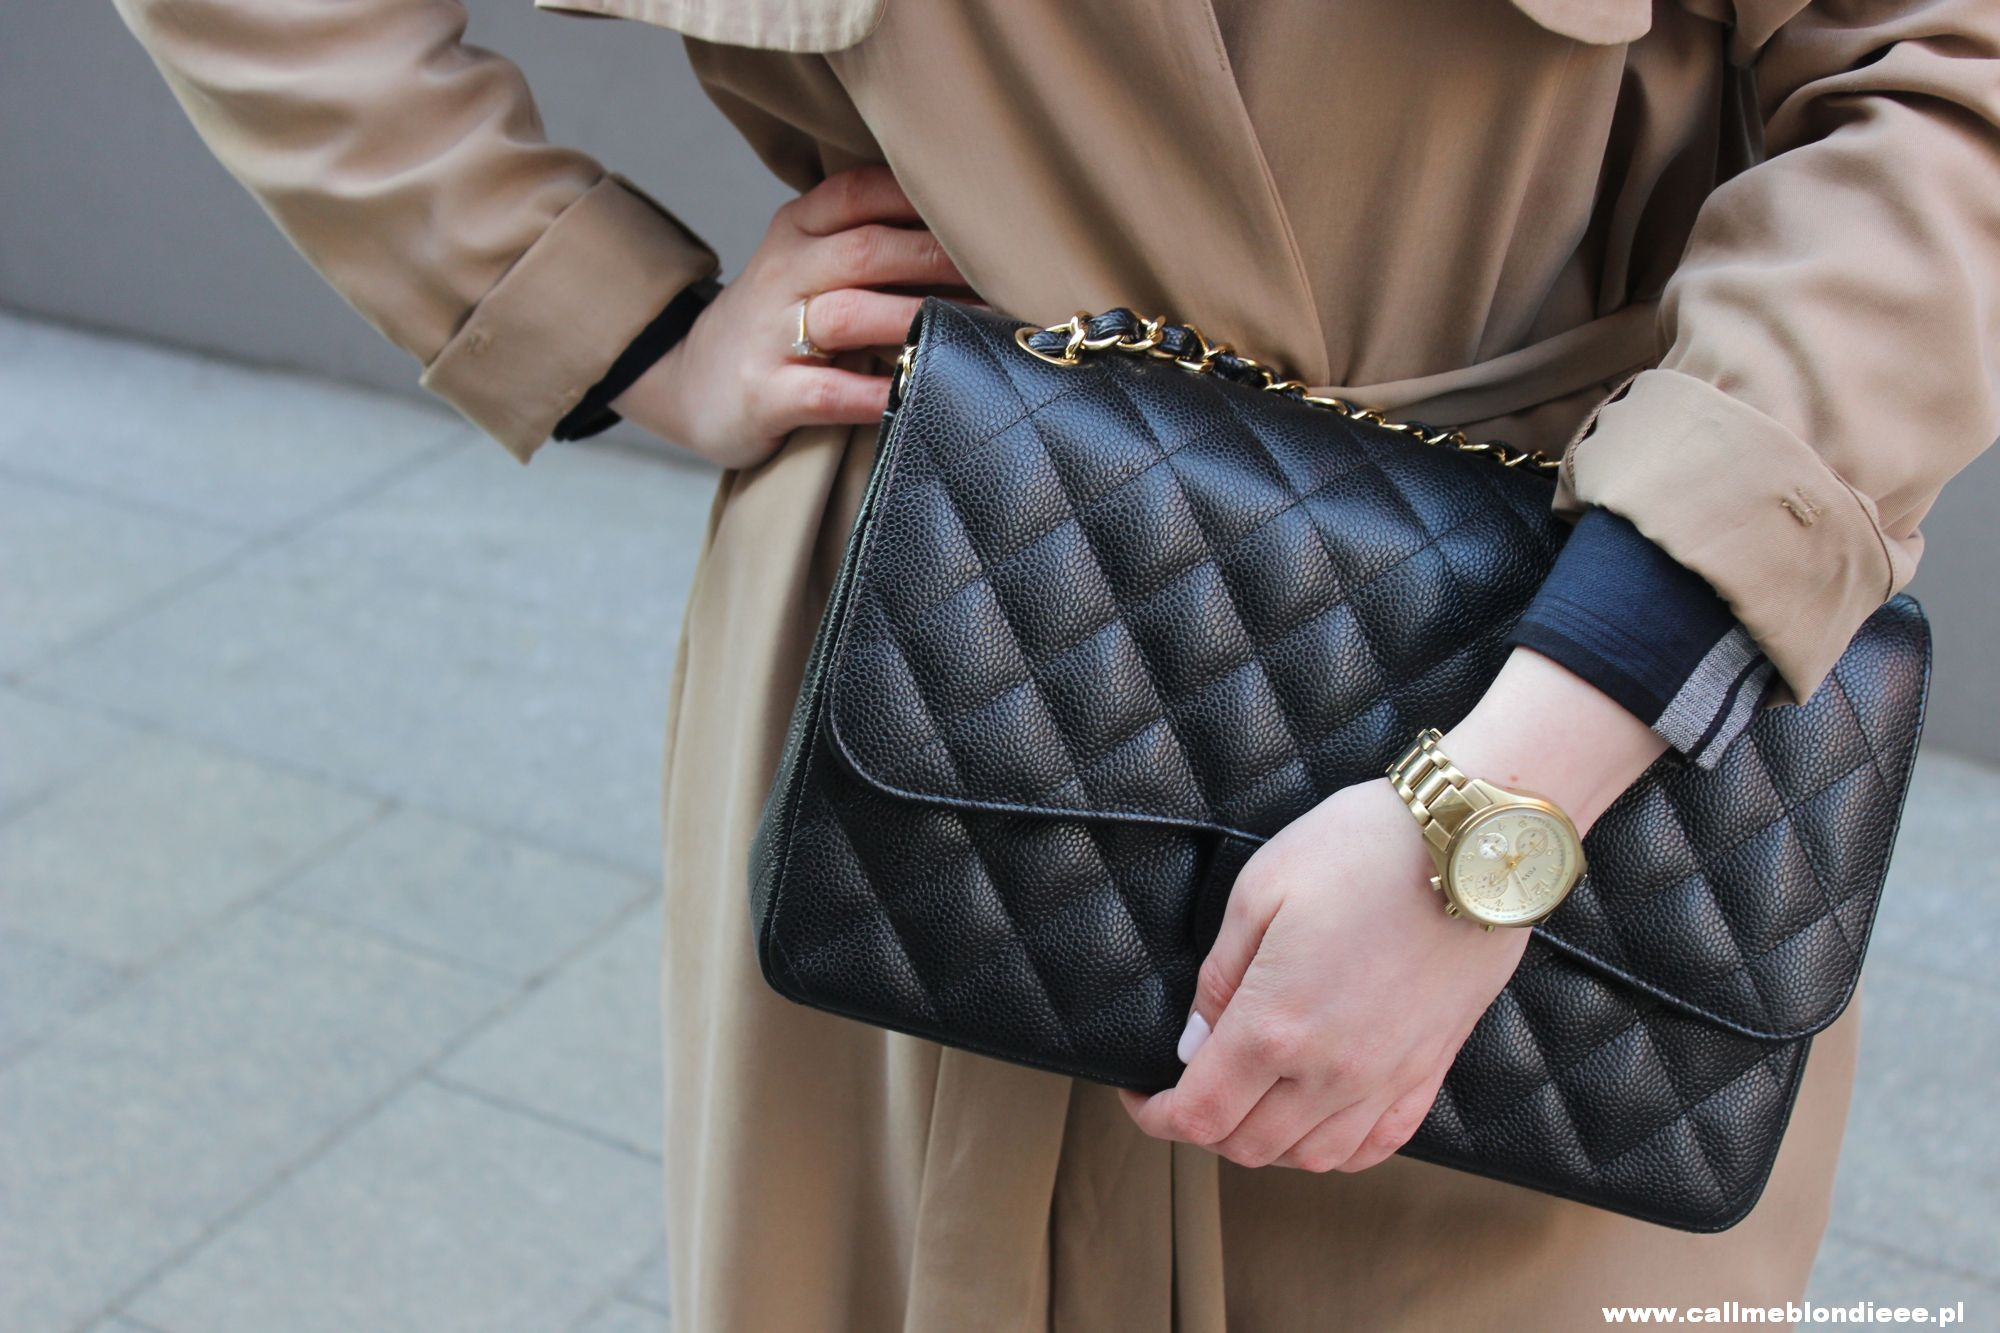 OOTD - Classic Look & Classic Bag 7